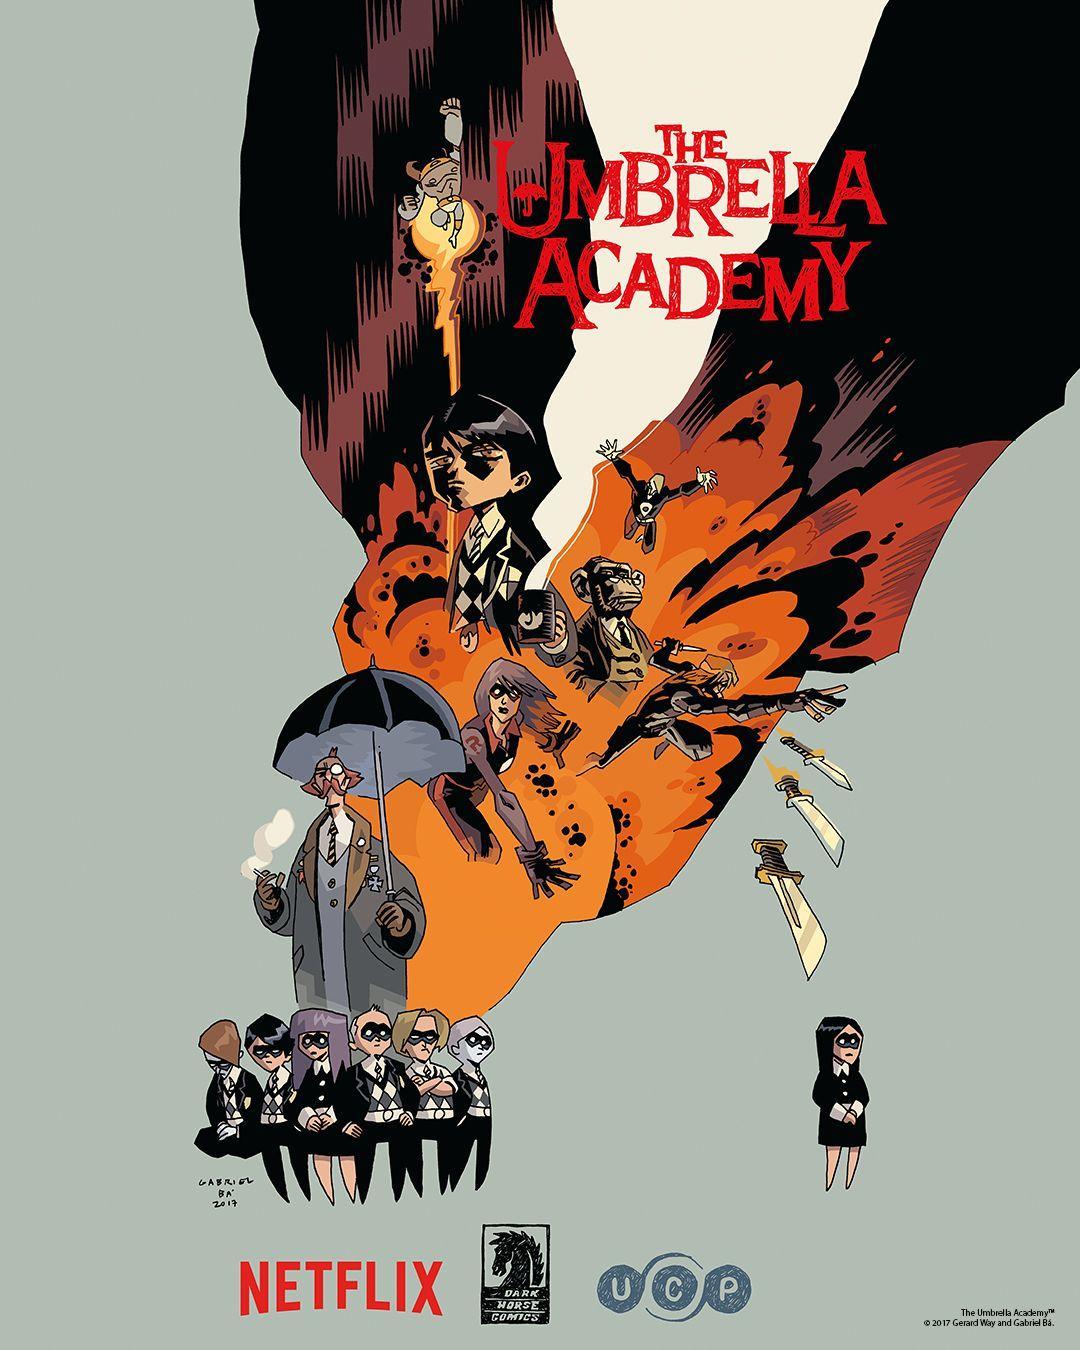 Anime 2019 Imdb: The Umbrella Academy Wallpapers